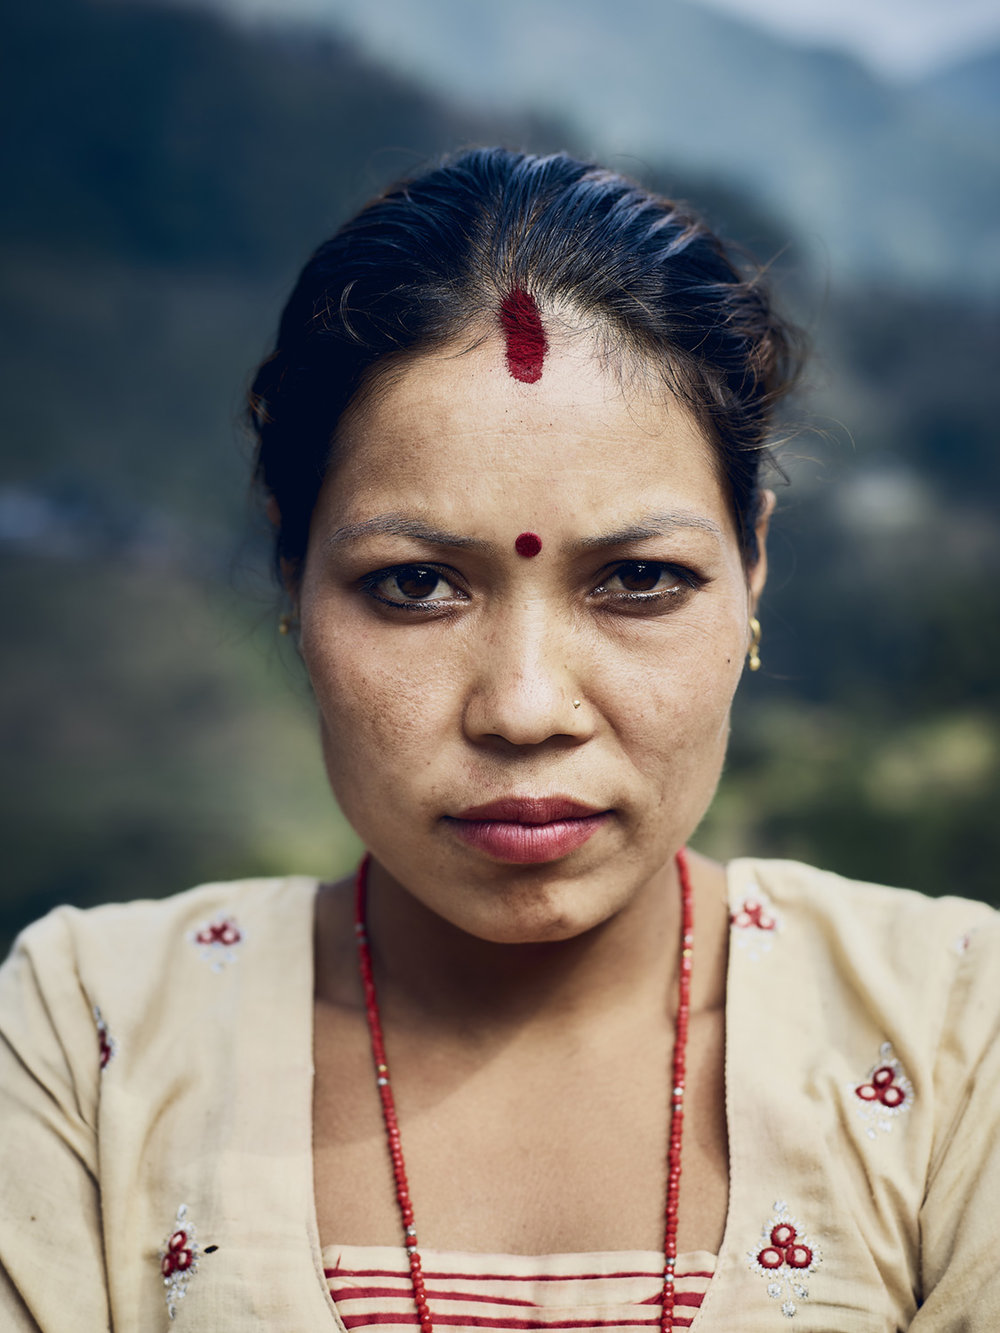 247_TF_Nepal17_CF011935_MJP.jpg